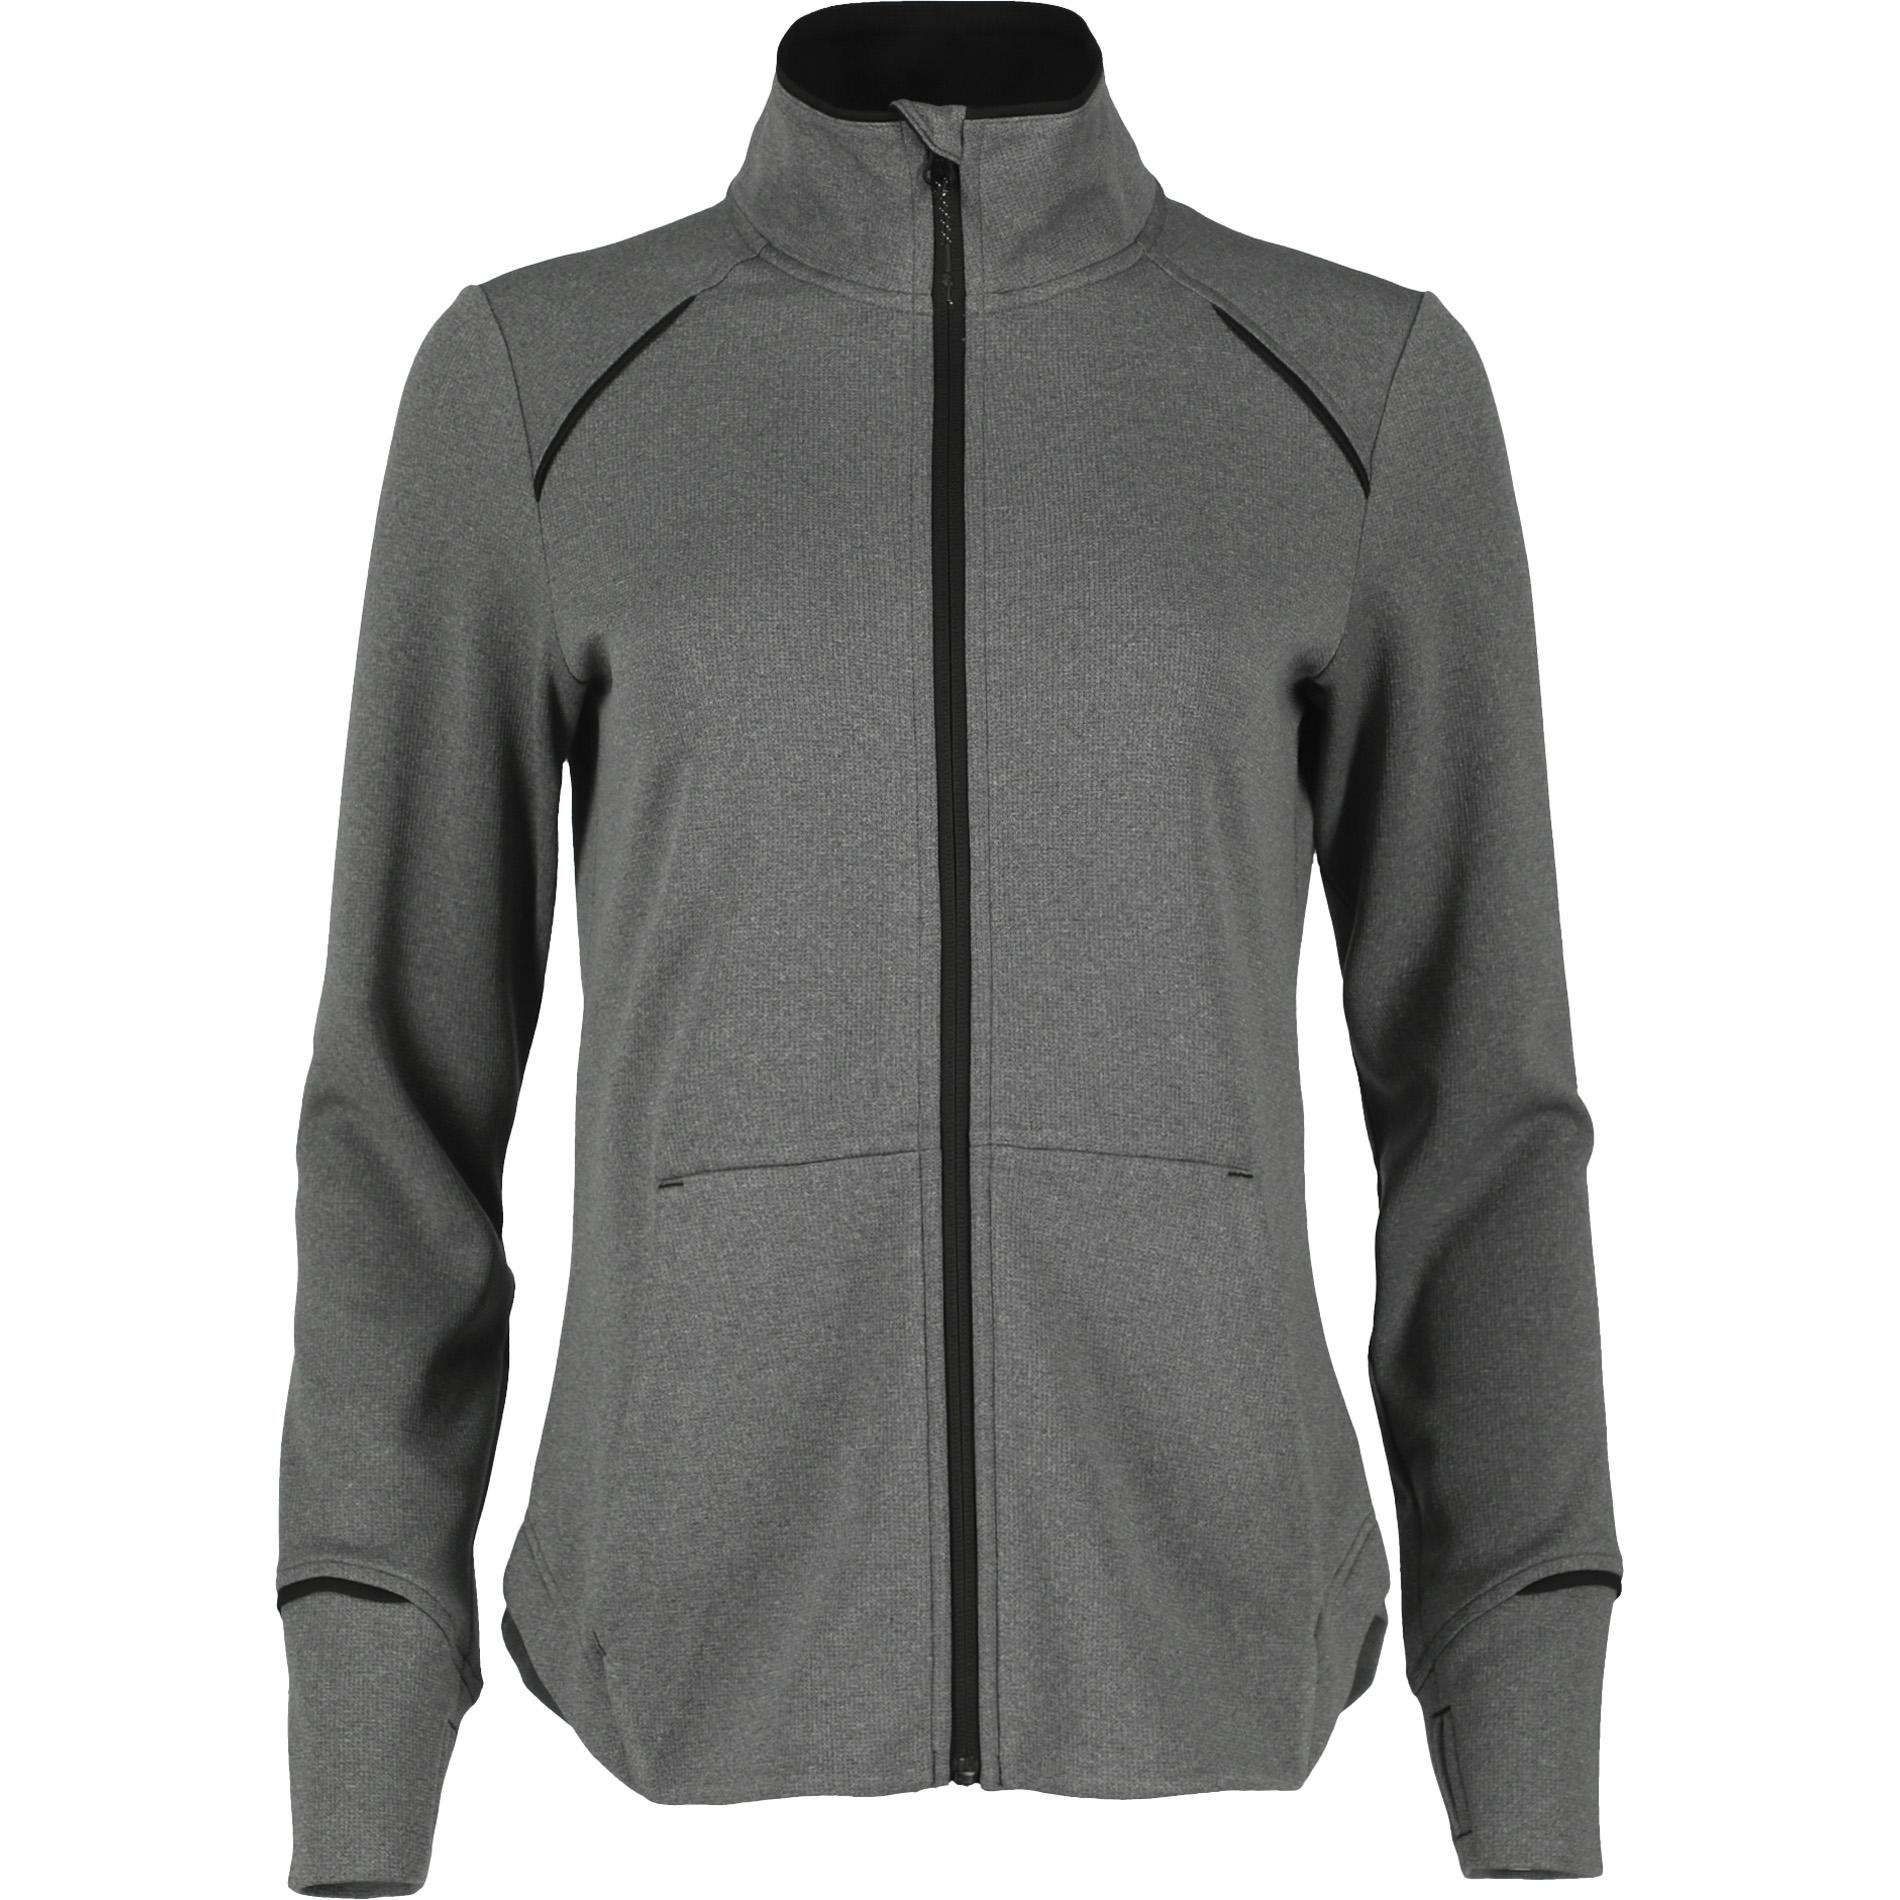 Elevate TM98137 - Women's TAMARACK Full Zip Jacket